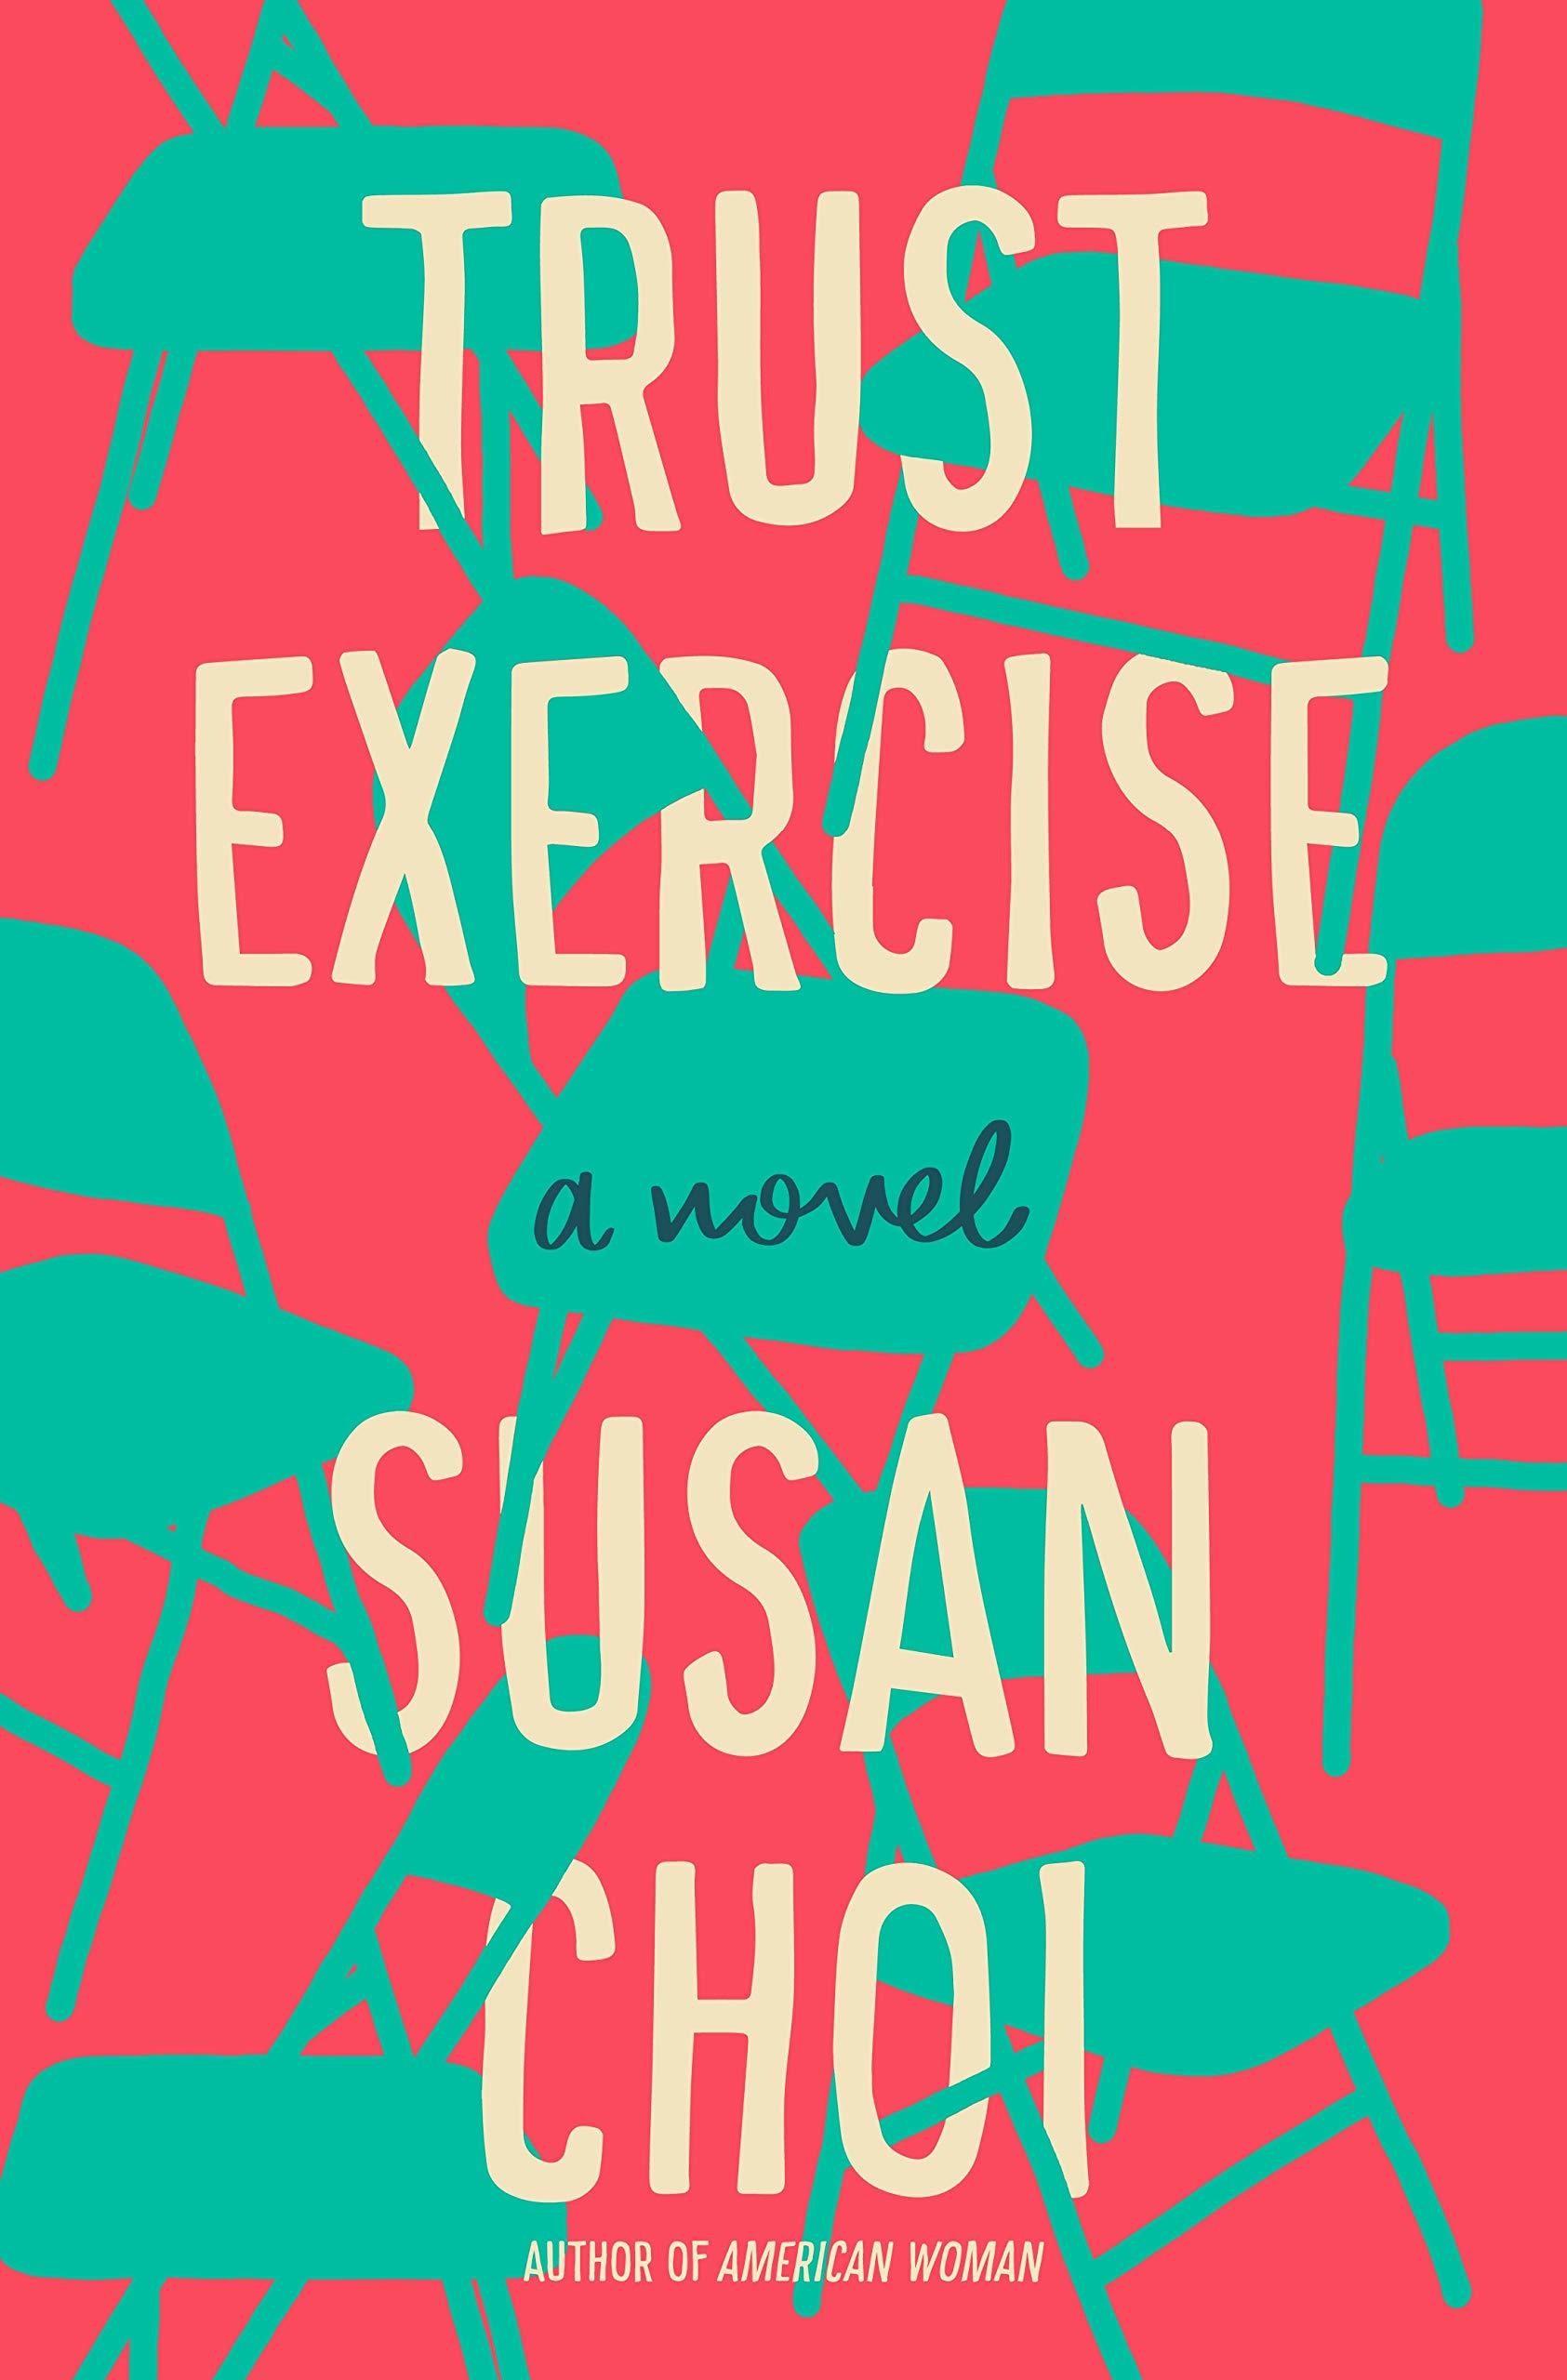 'Trust Exercise' by Susan Choi read reading novel literature education Barack Obama